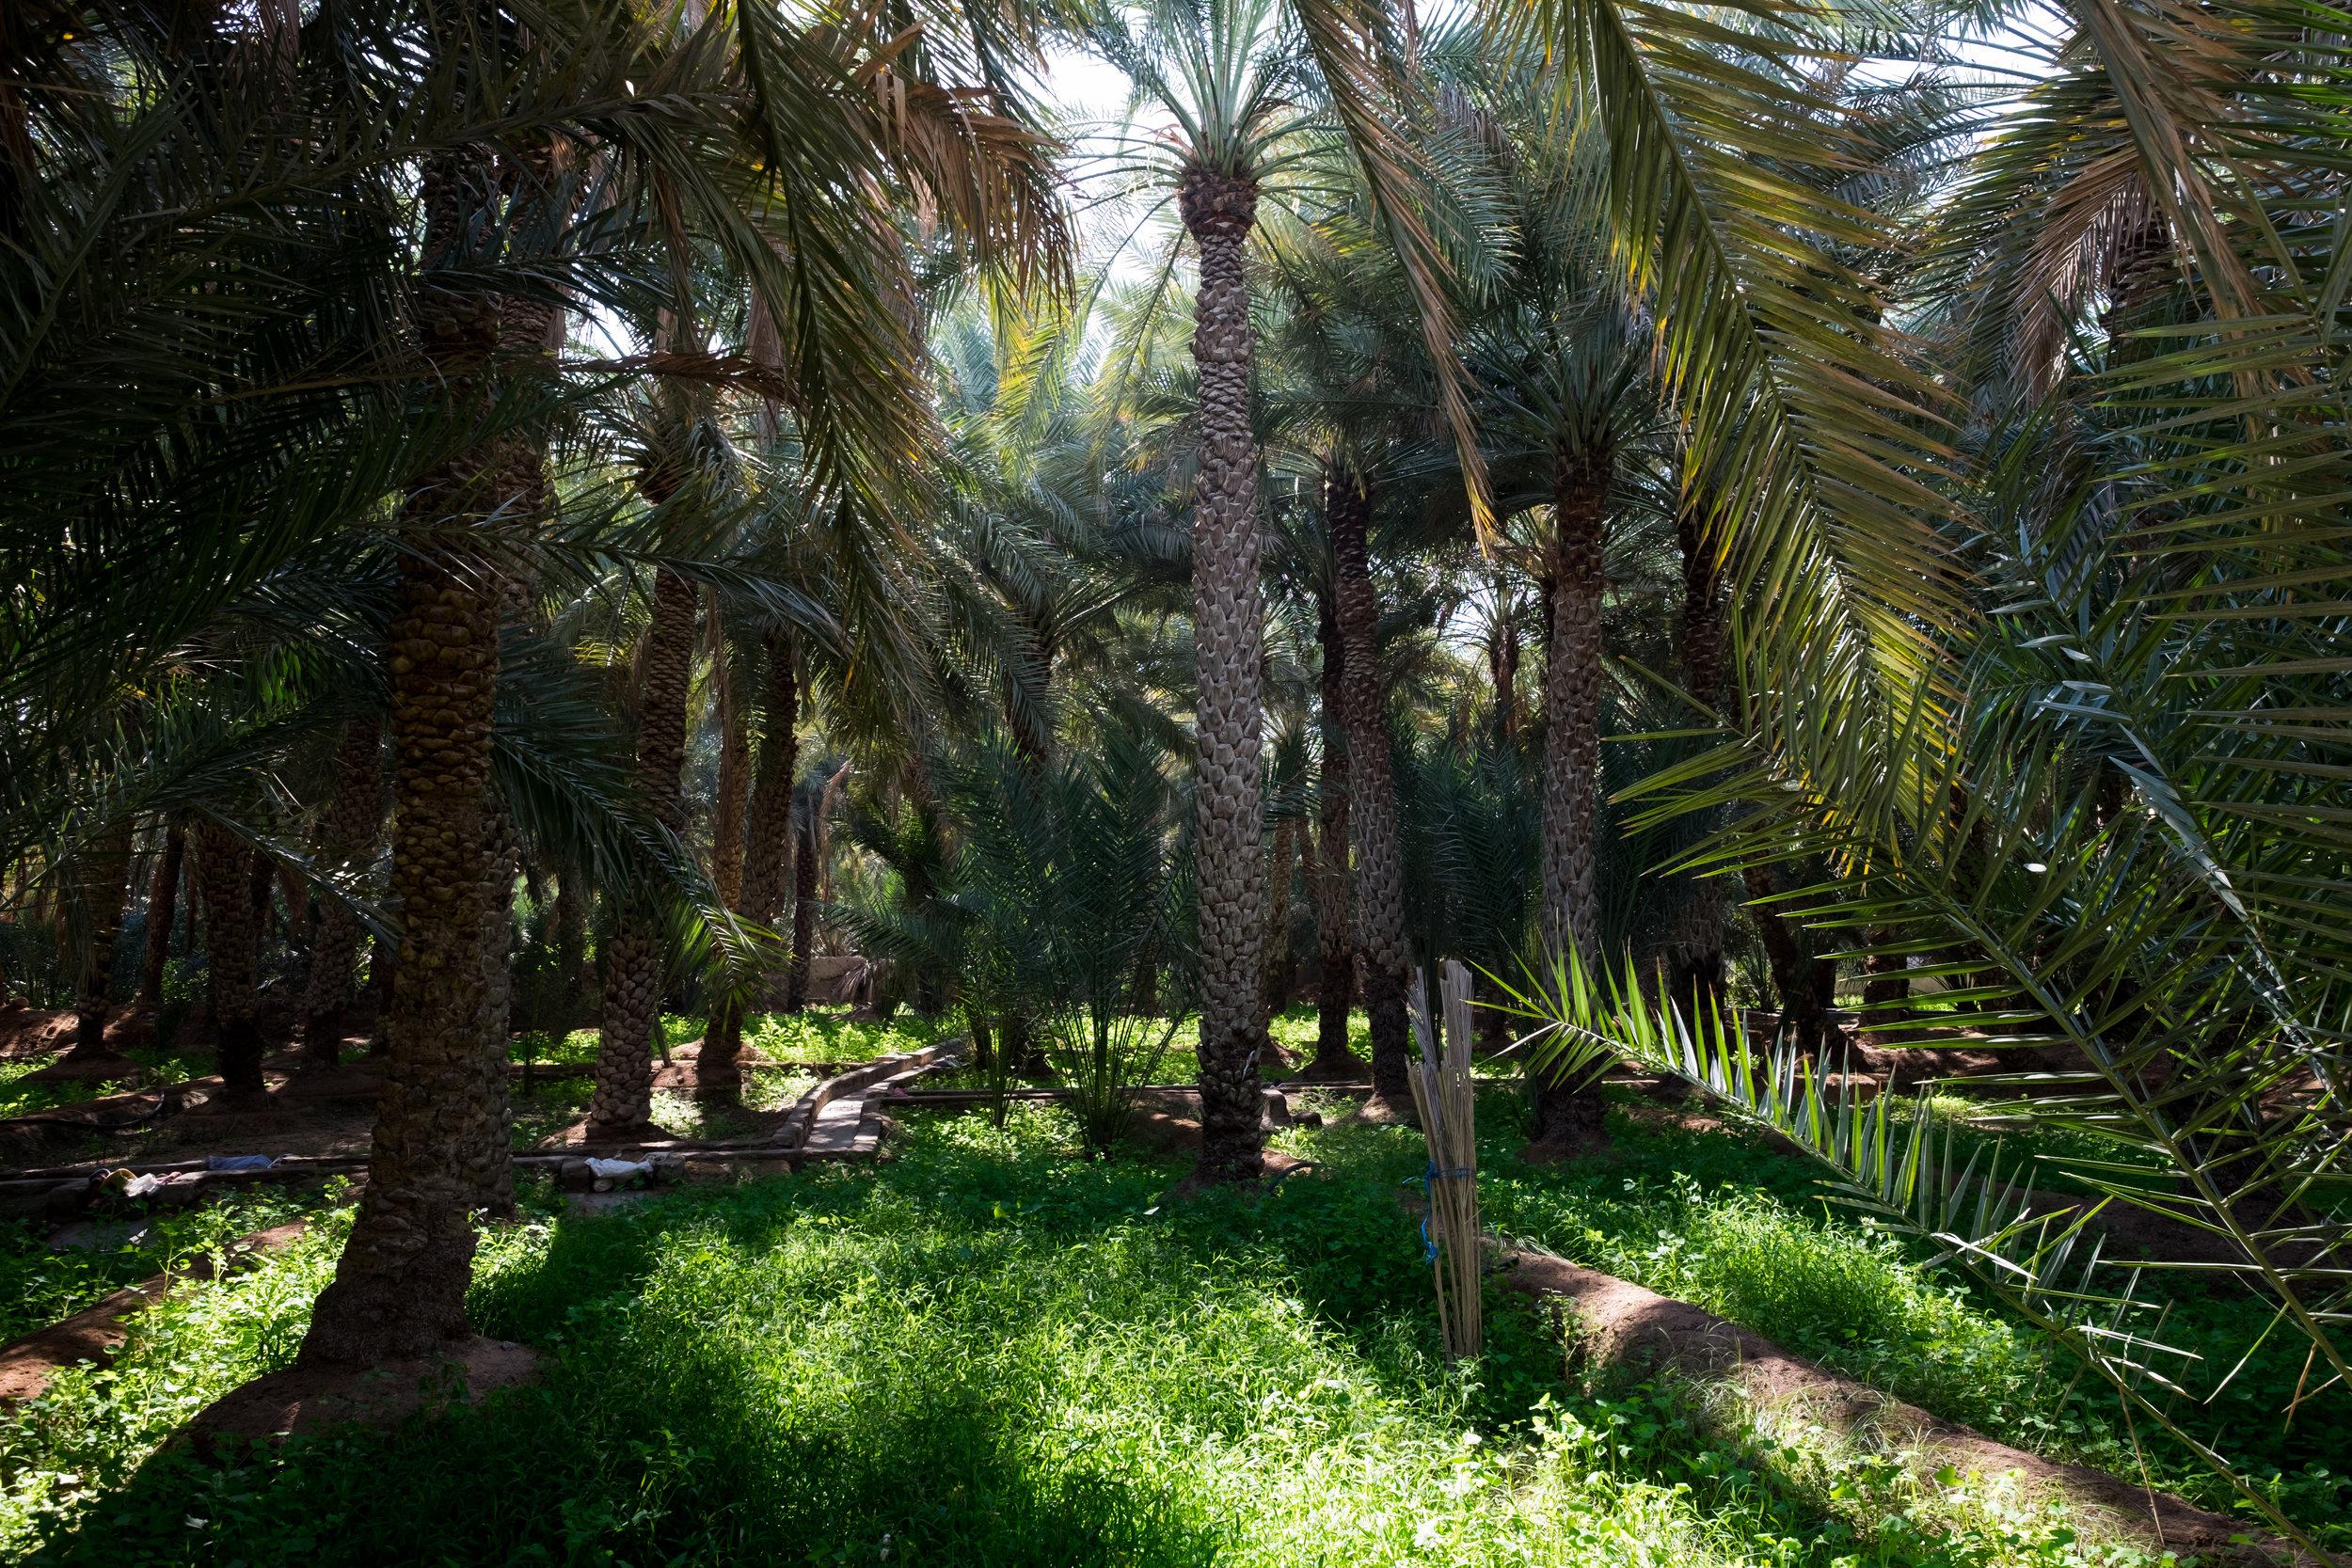 al-ain-outskirts-6118.jpg